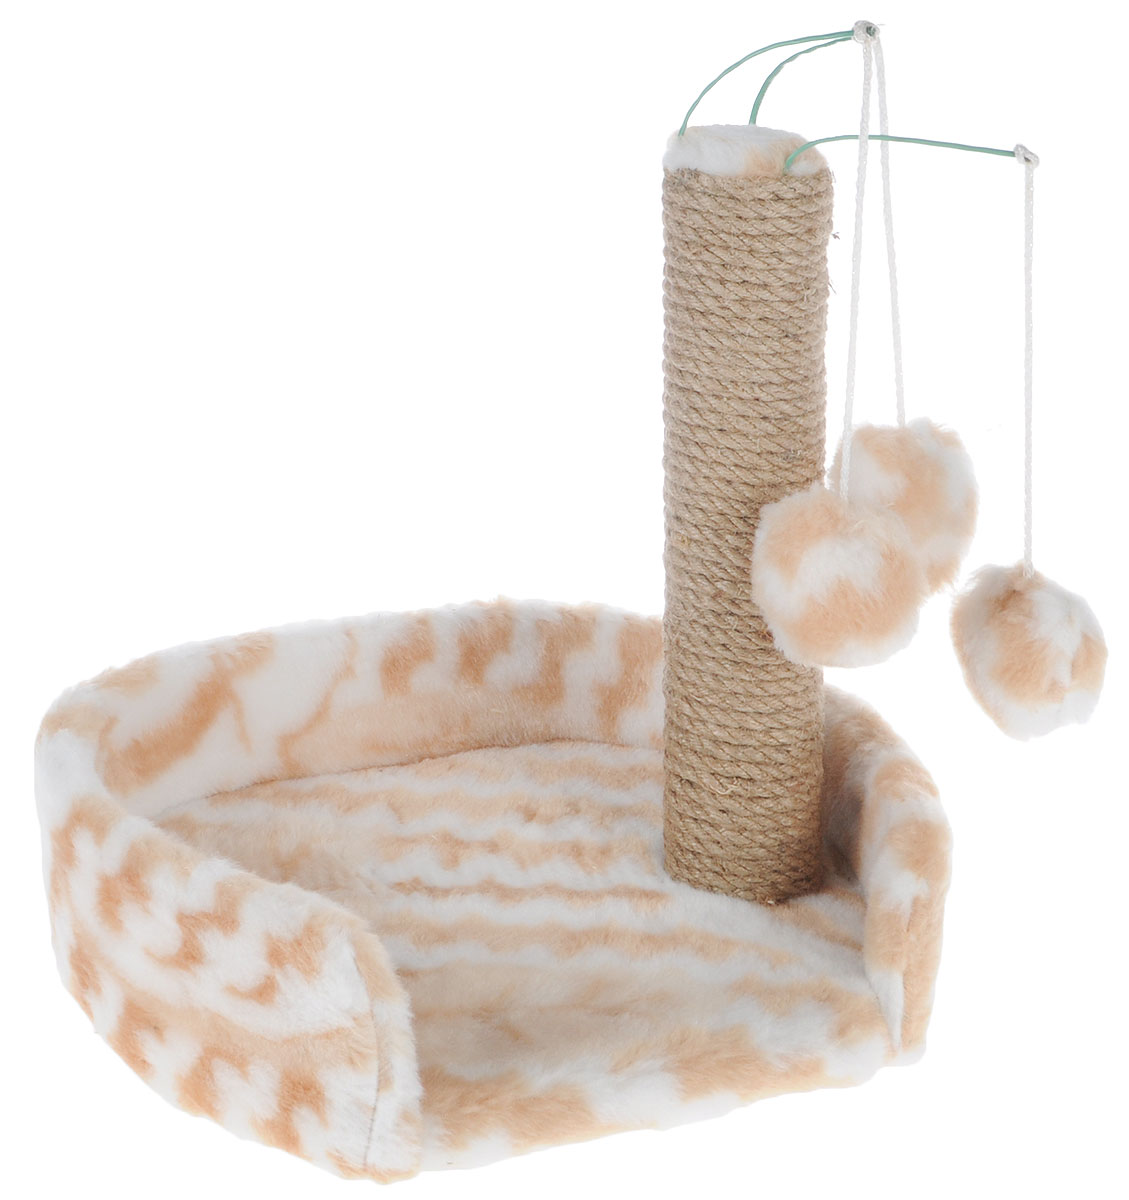 Когтеточка для котят Меридиан, с лежанкой, цвет: белый, бежевый, 34 х 26 х 34 см